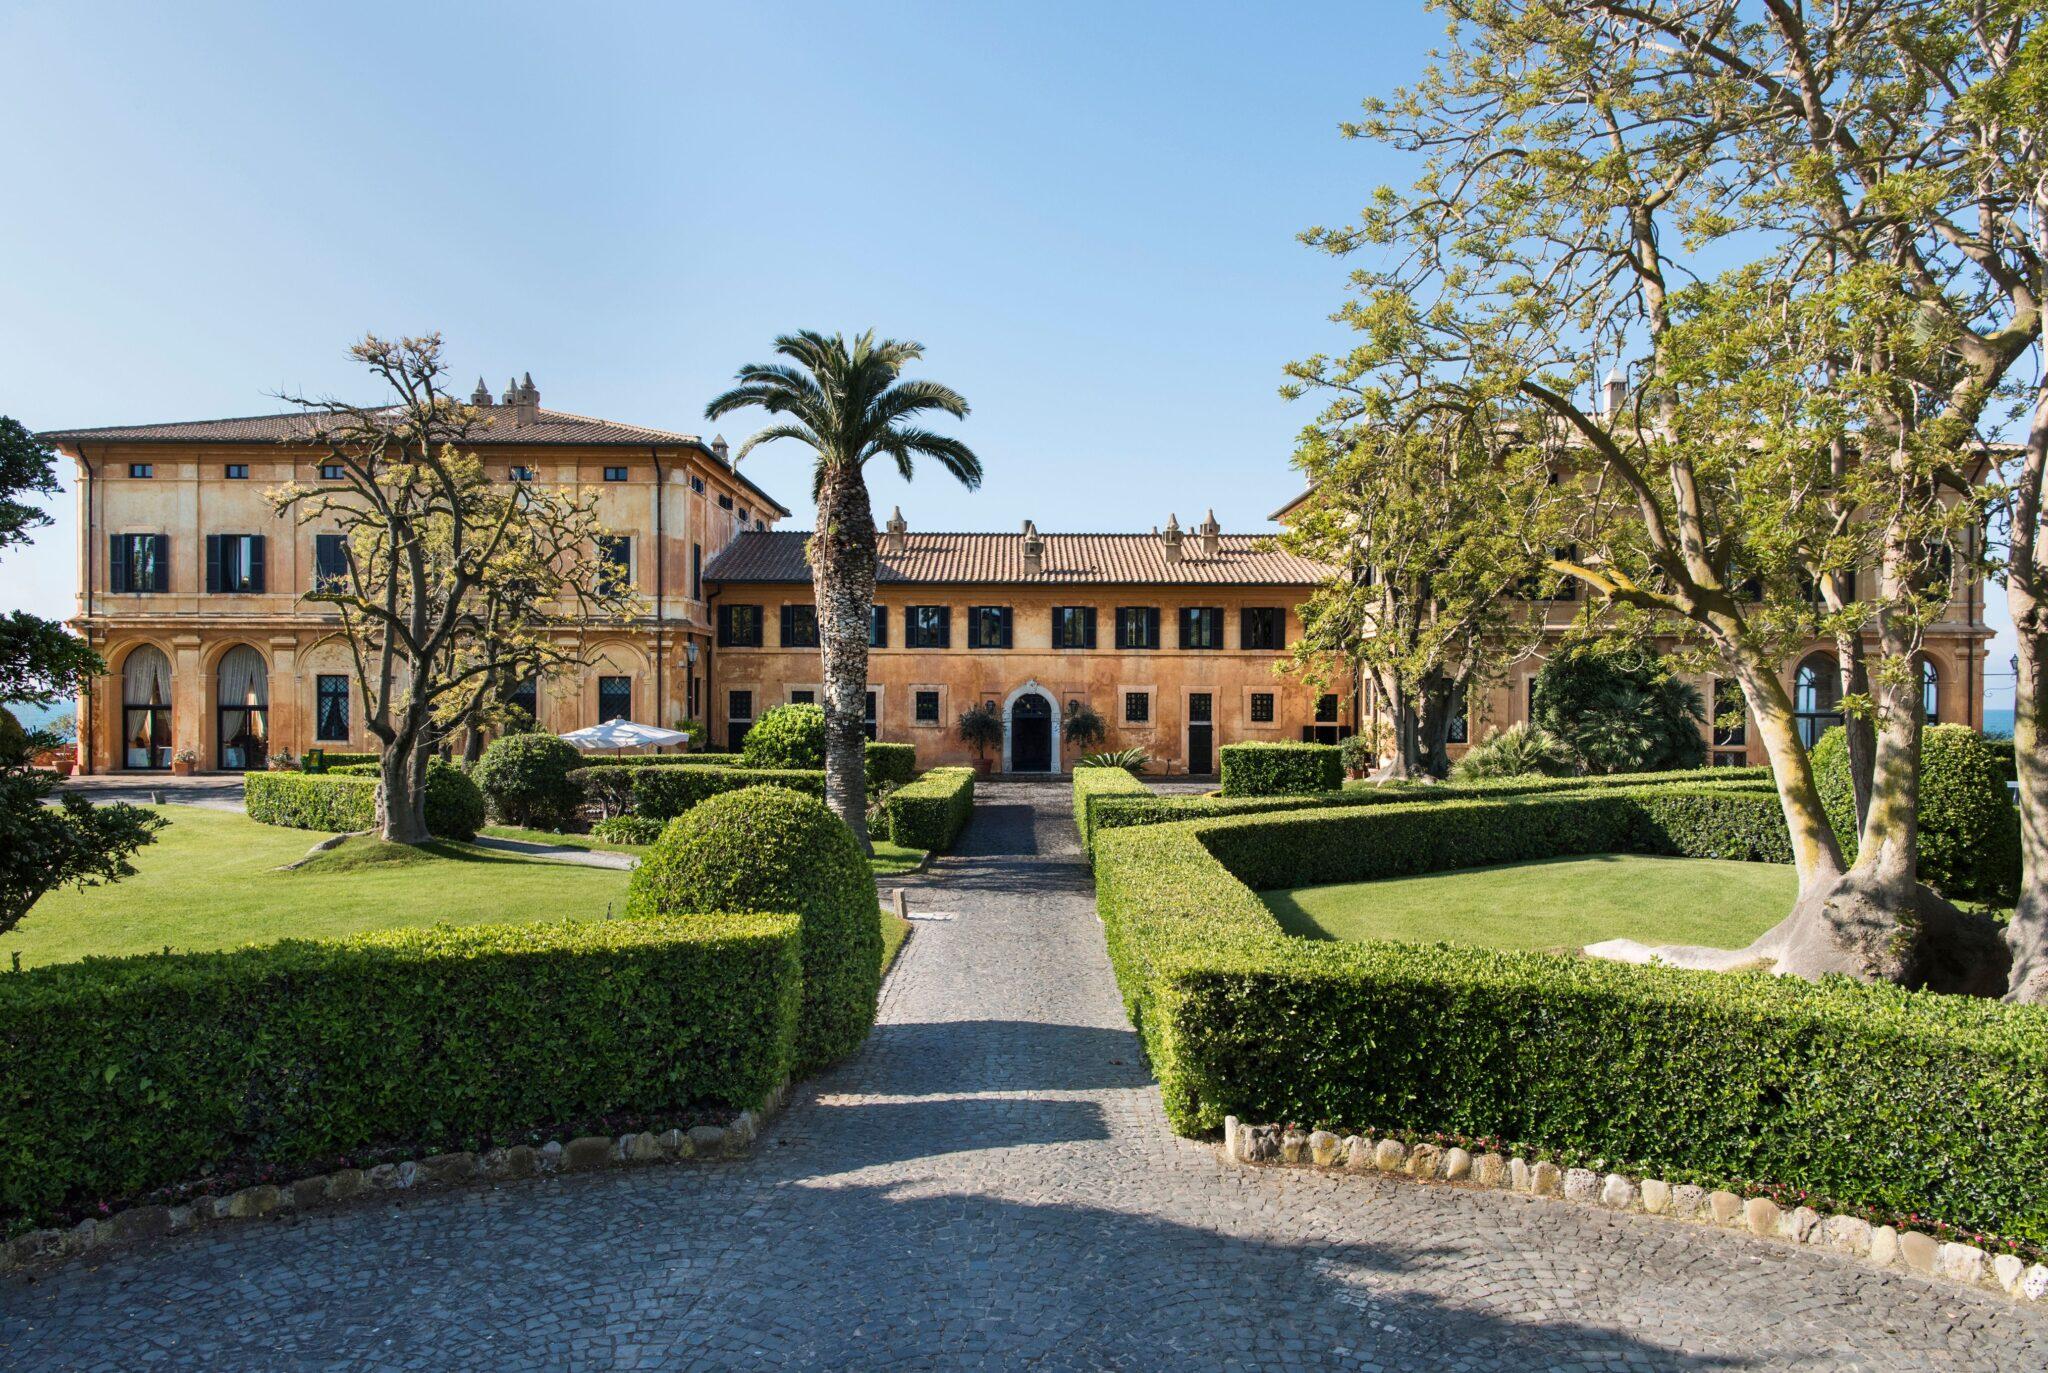 Nest Italy - Luxury Hotel near Rome